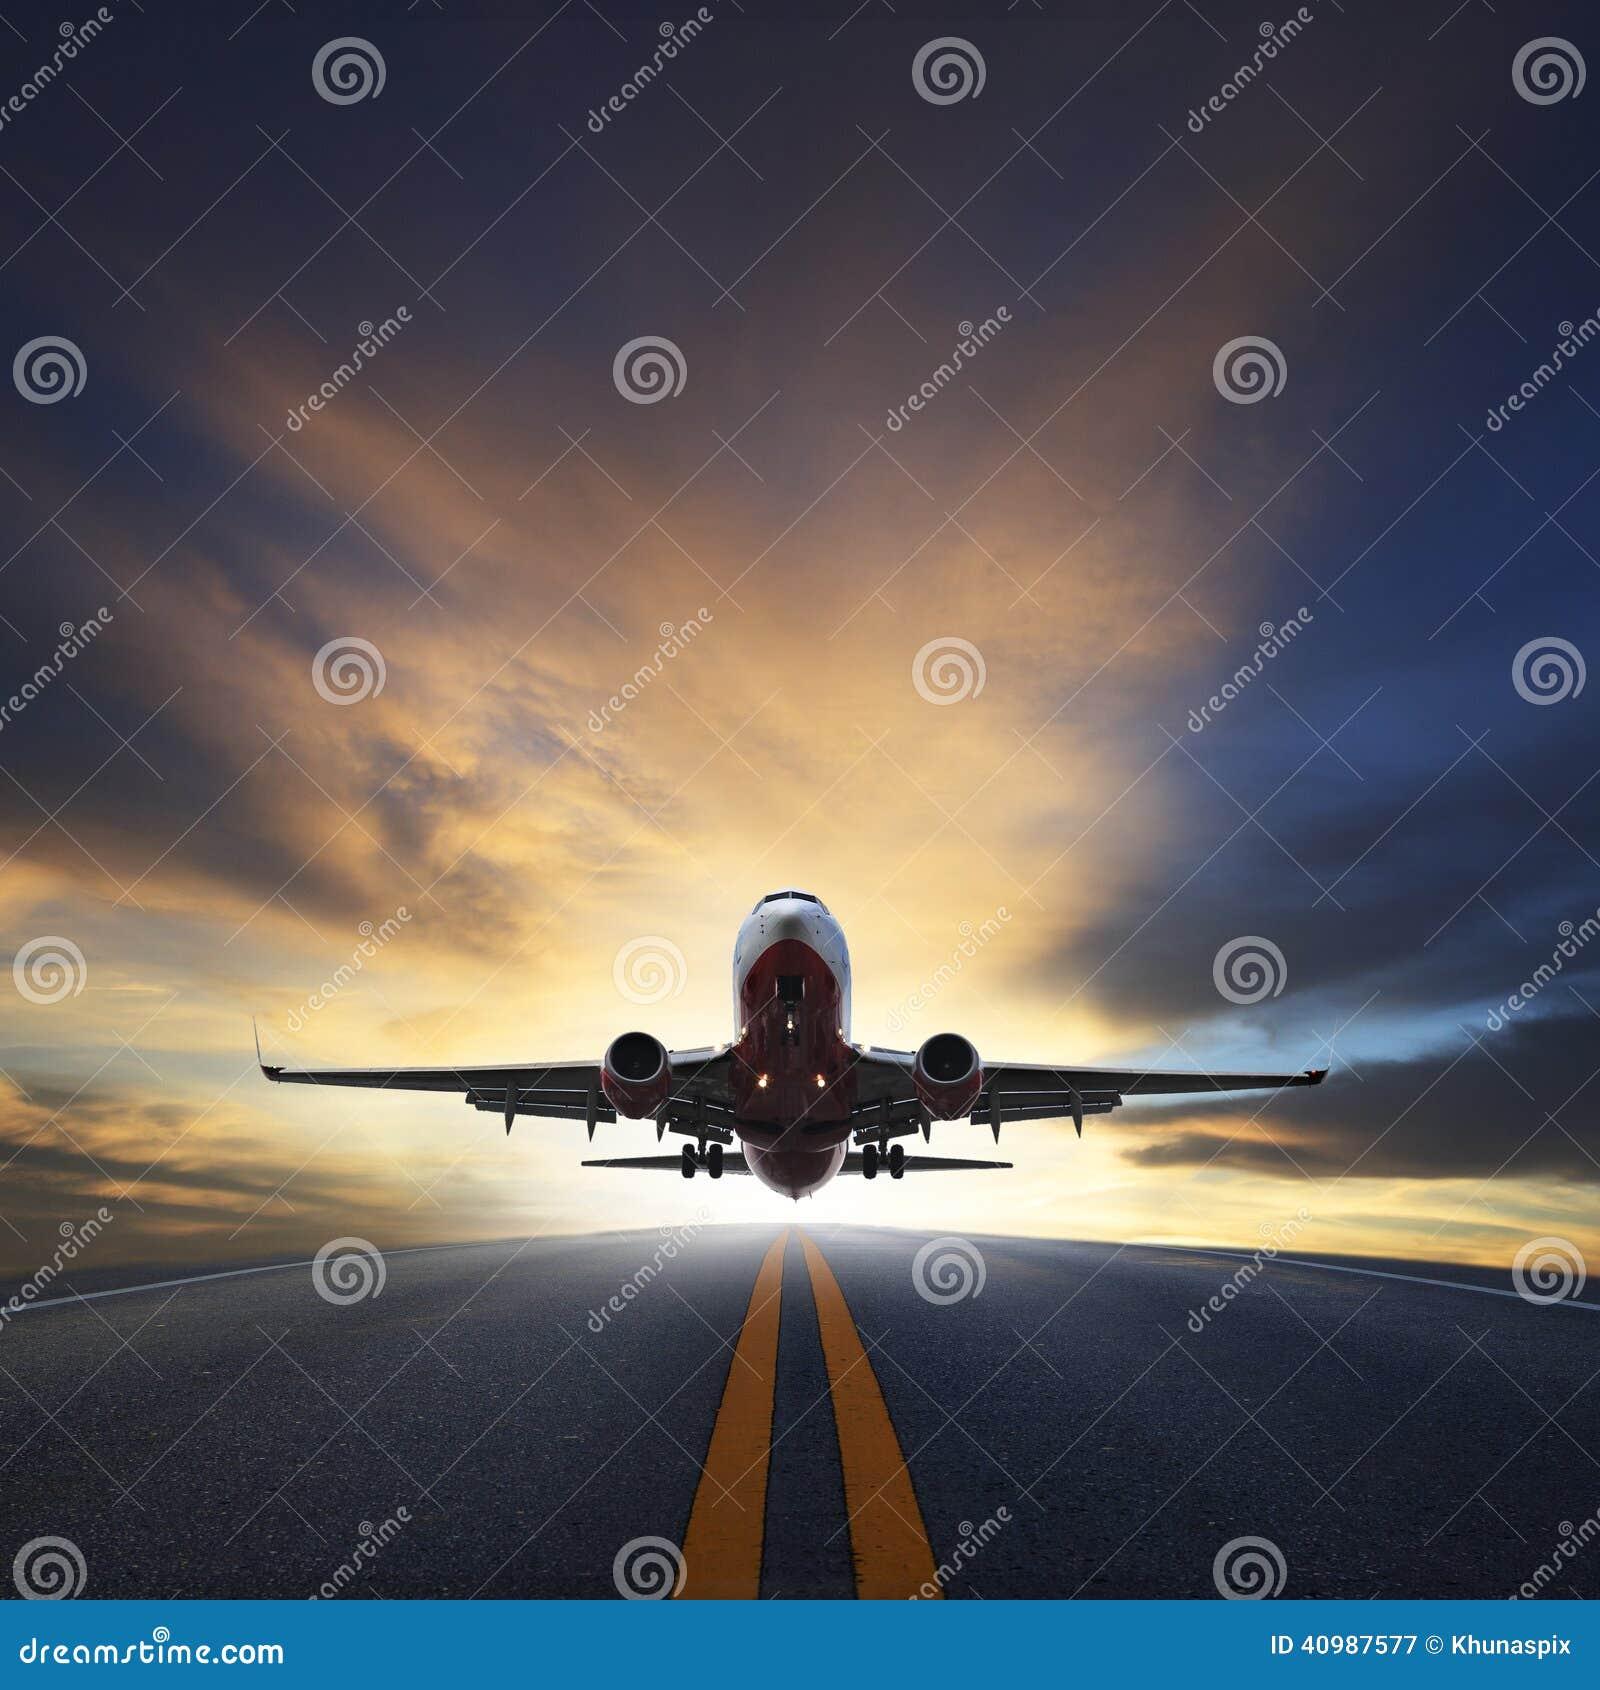 Passenger plane take off from runways against beautiful dusky sk